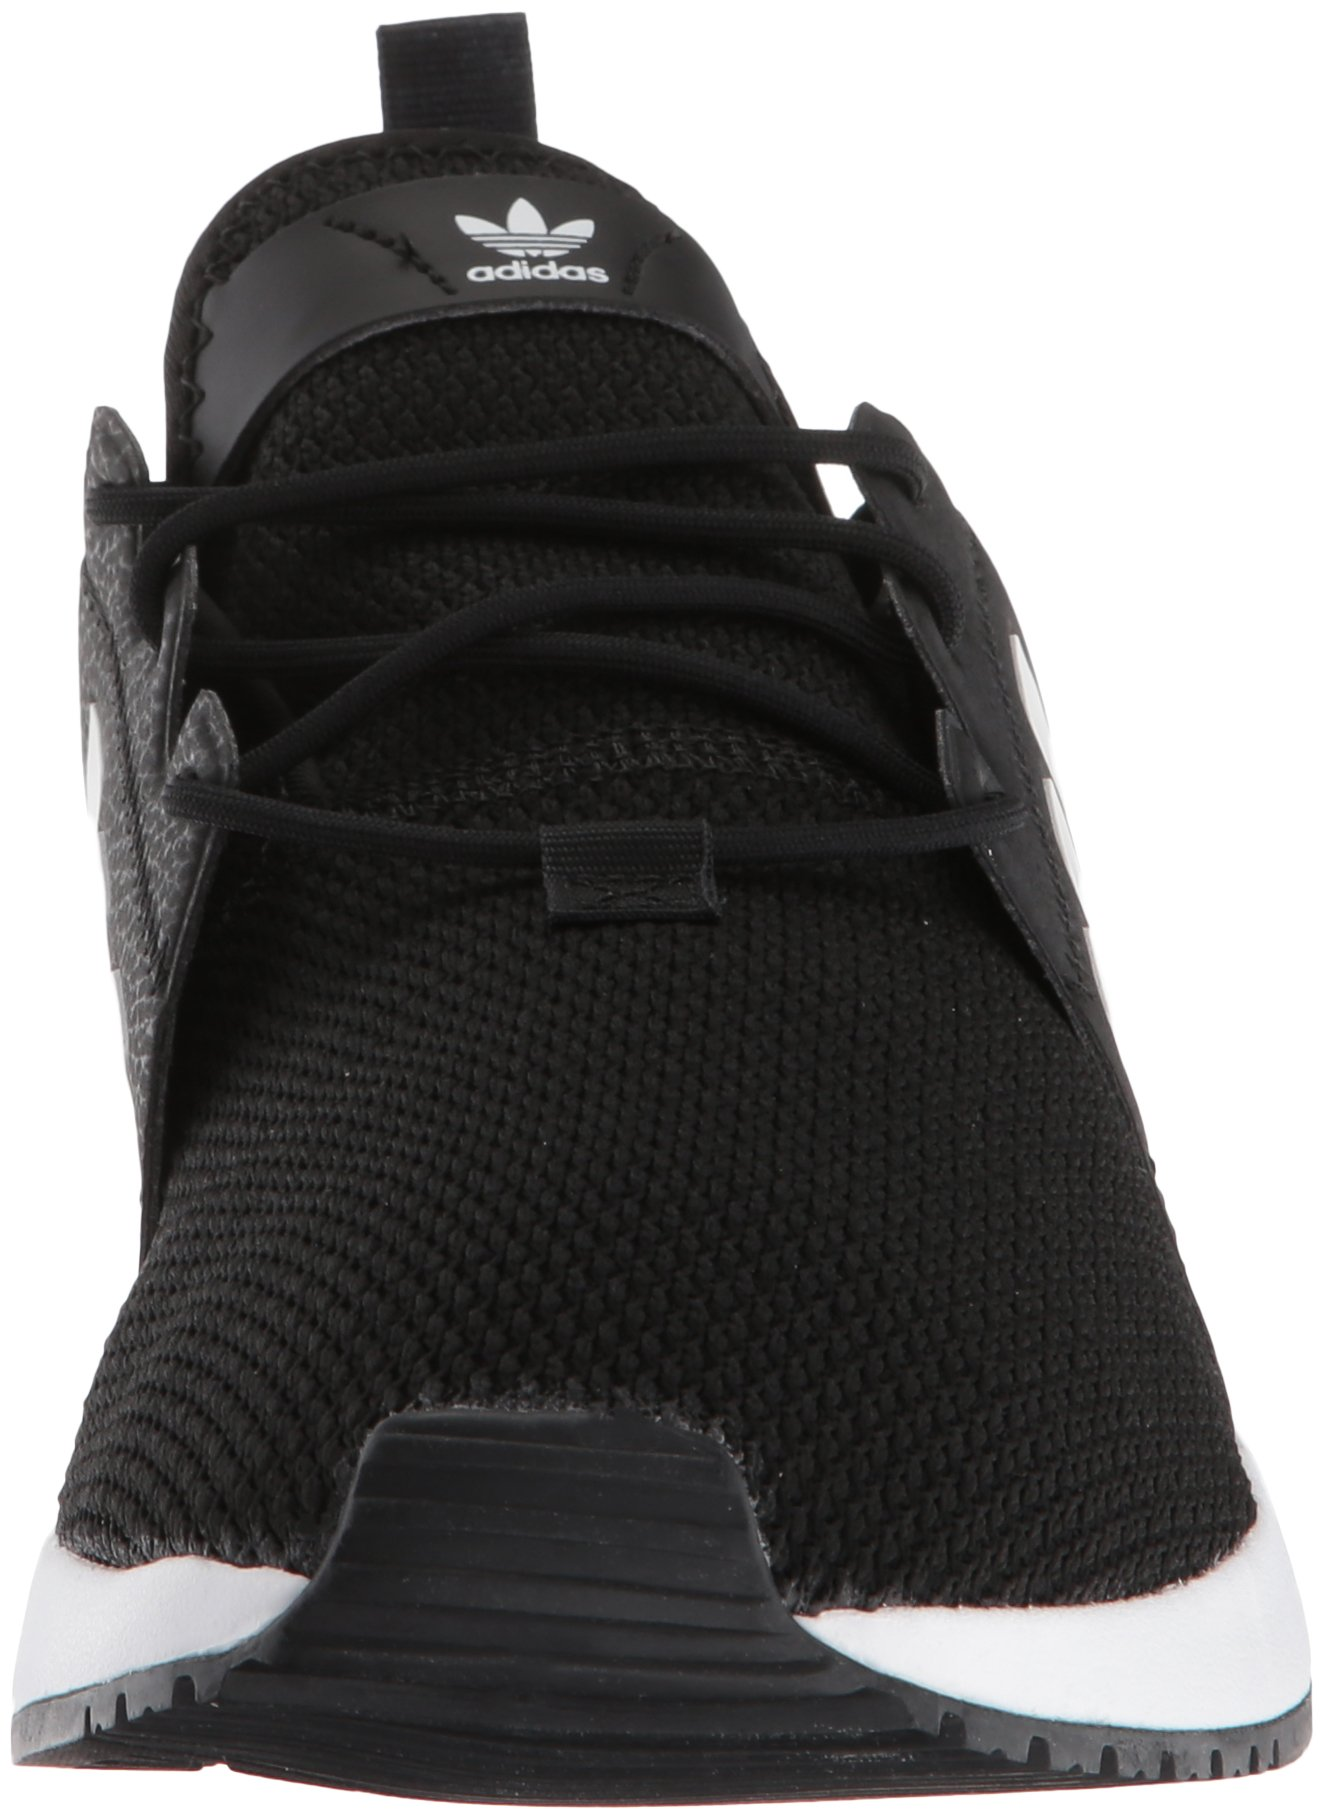 adidas Originals Mens X_PLR Running Shoe White/Black, 5 M US by adidas Originals (Image #4)